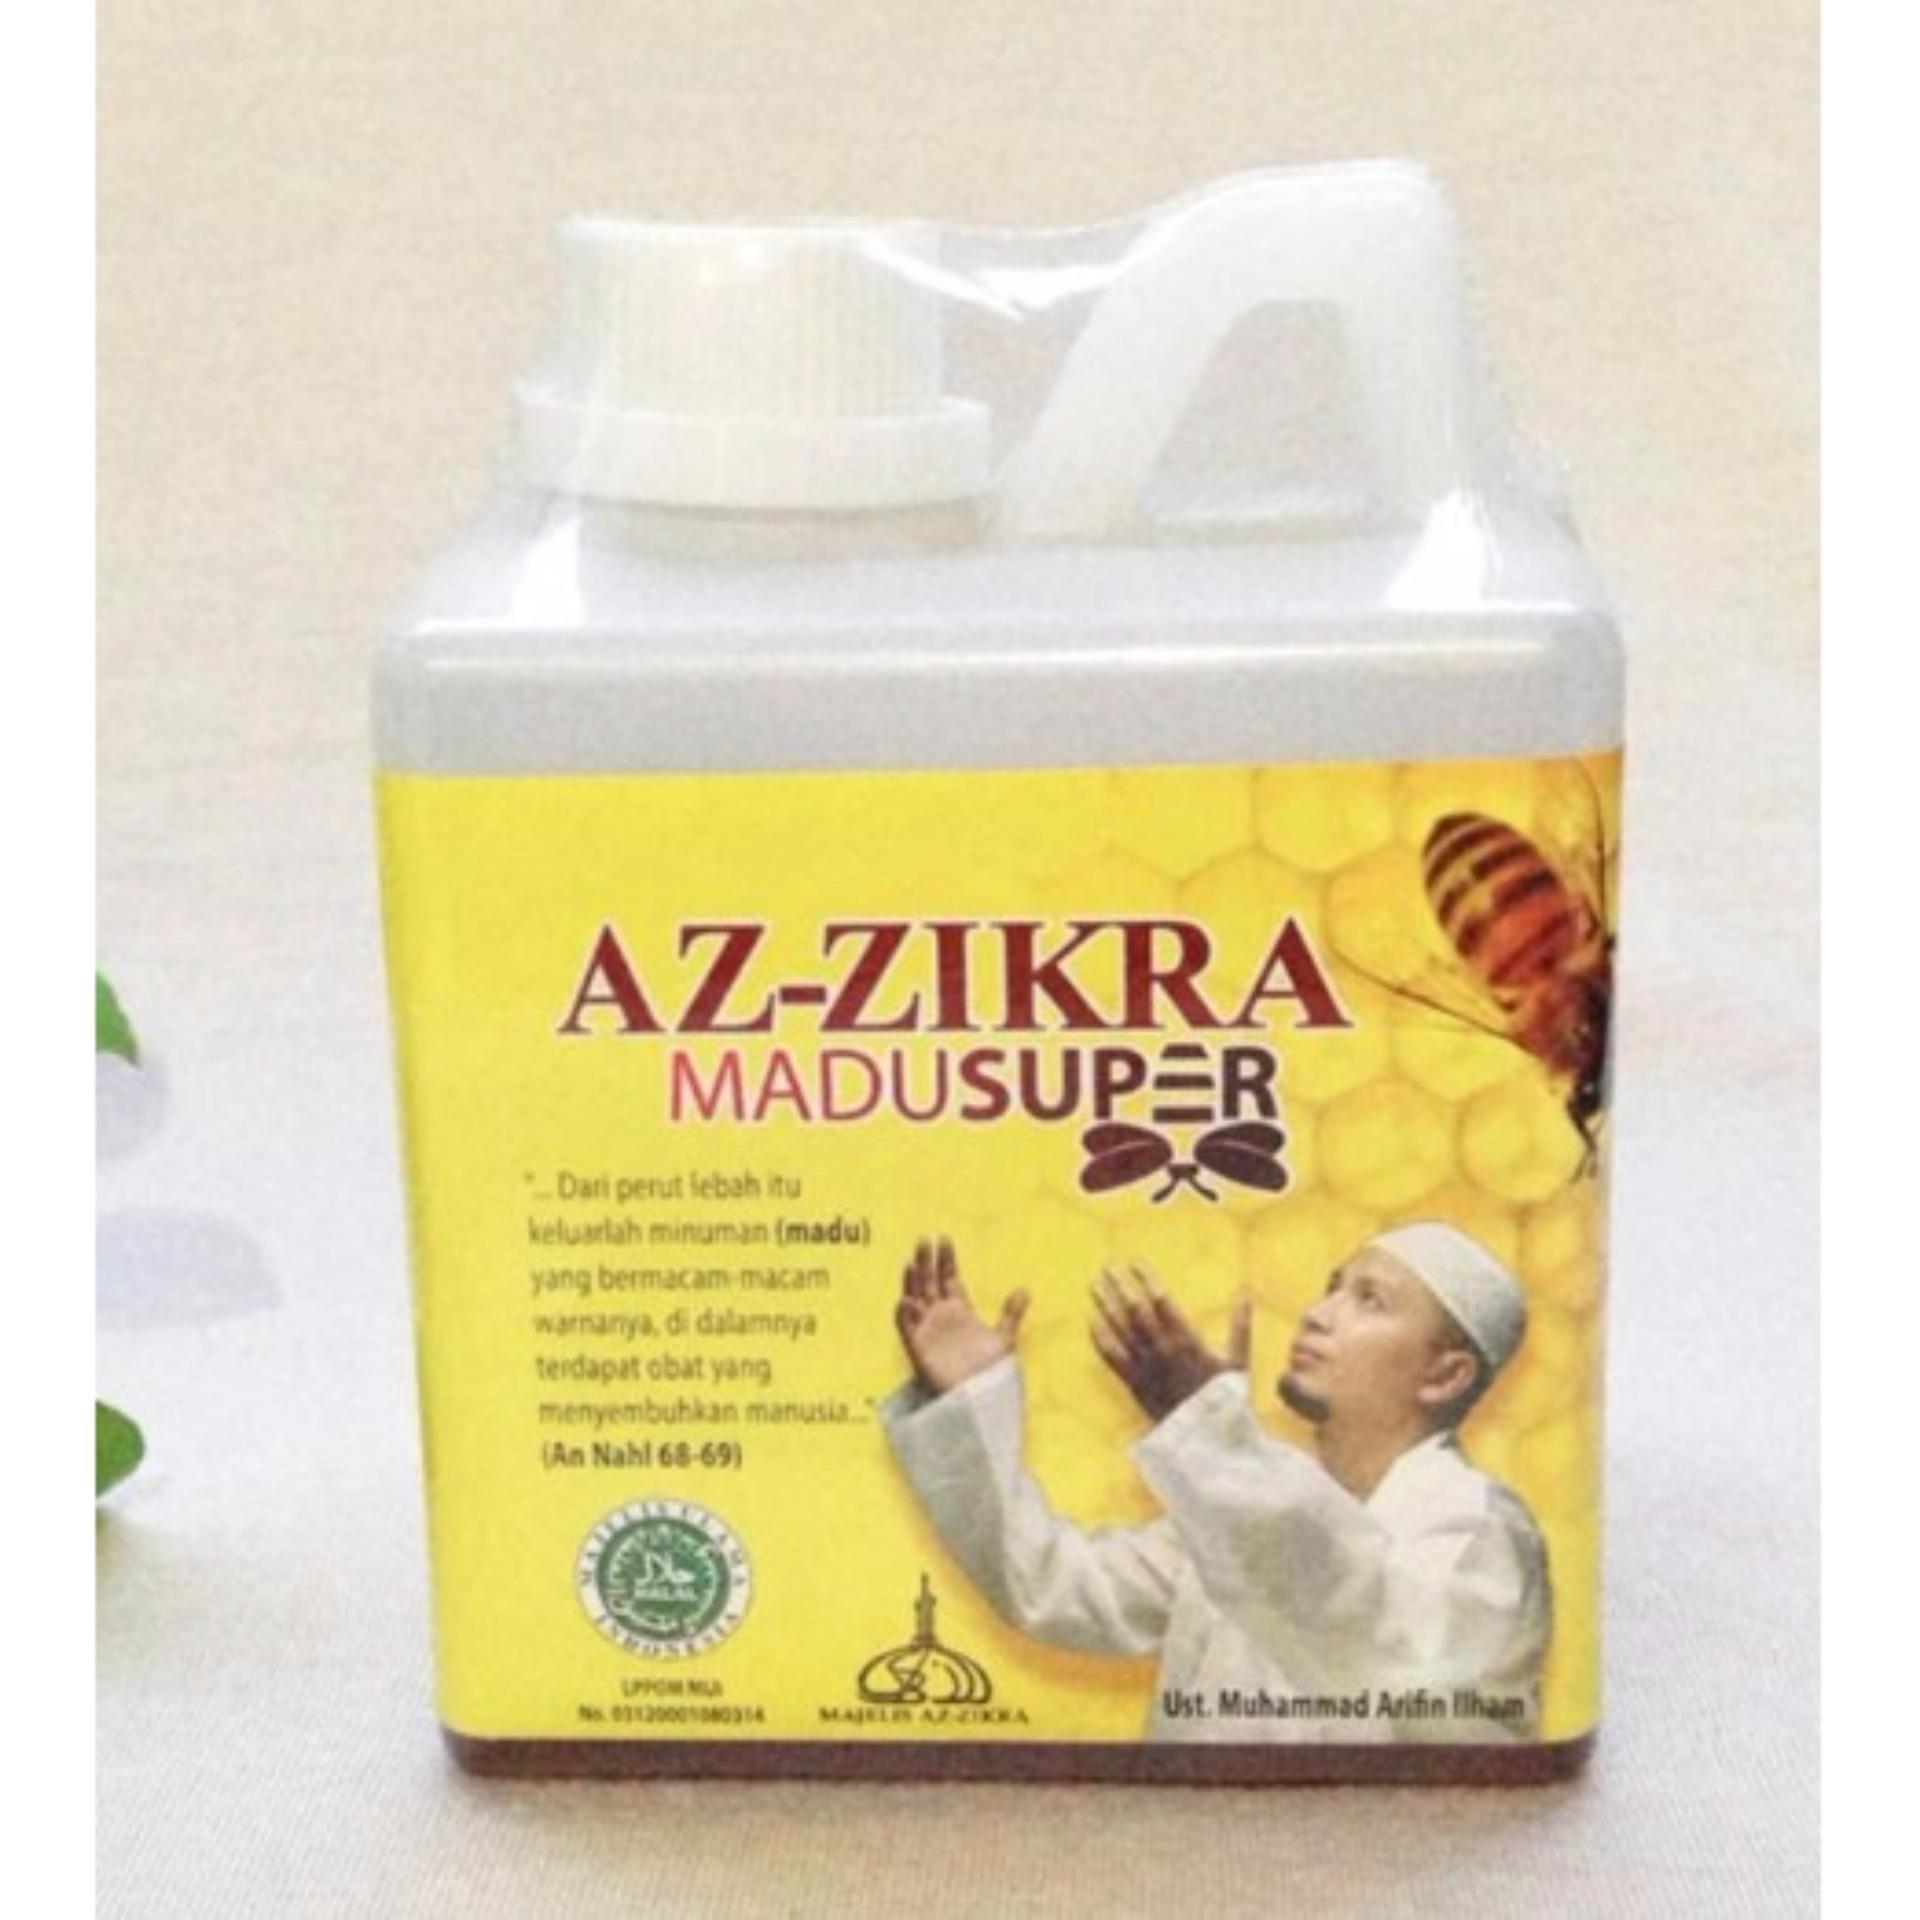 ZIE Madu Super Az Zikra 500 gr Doa Ustadz Arifin Ilham Asli Jaga Kesehatan ...